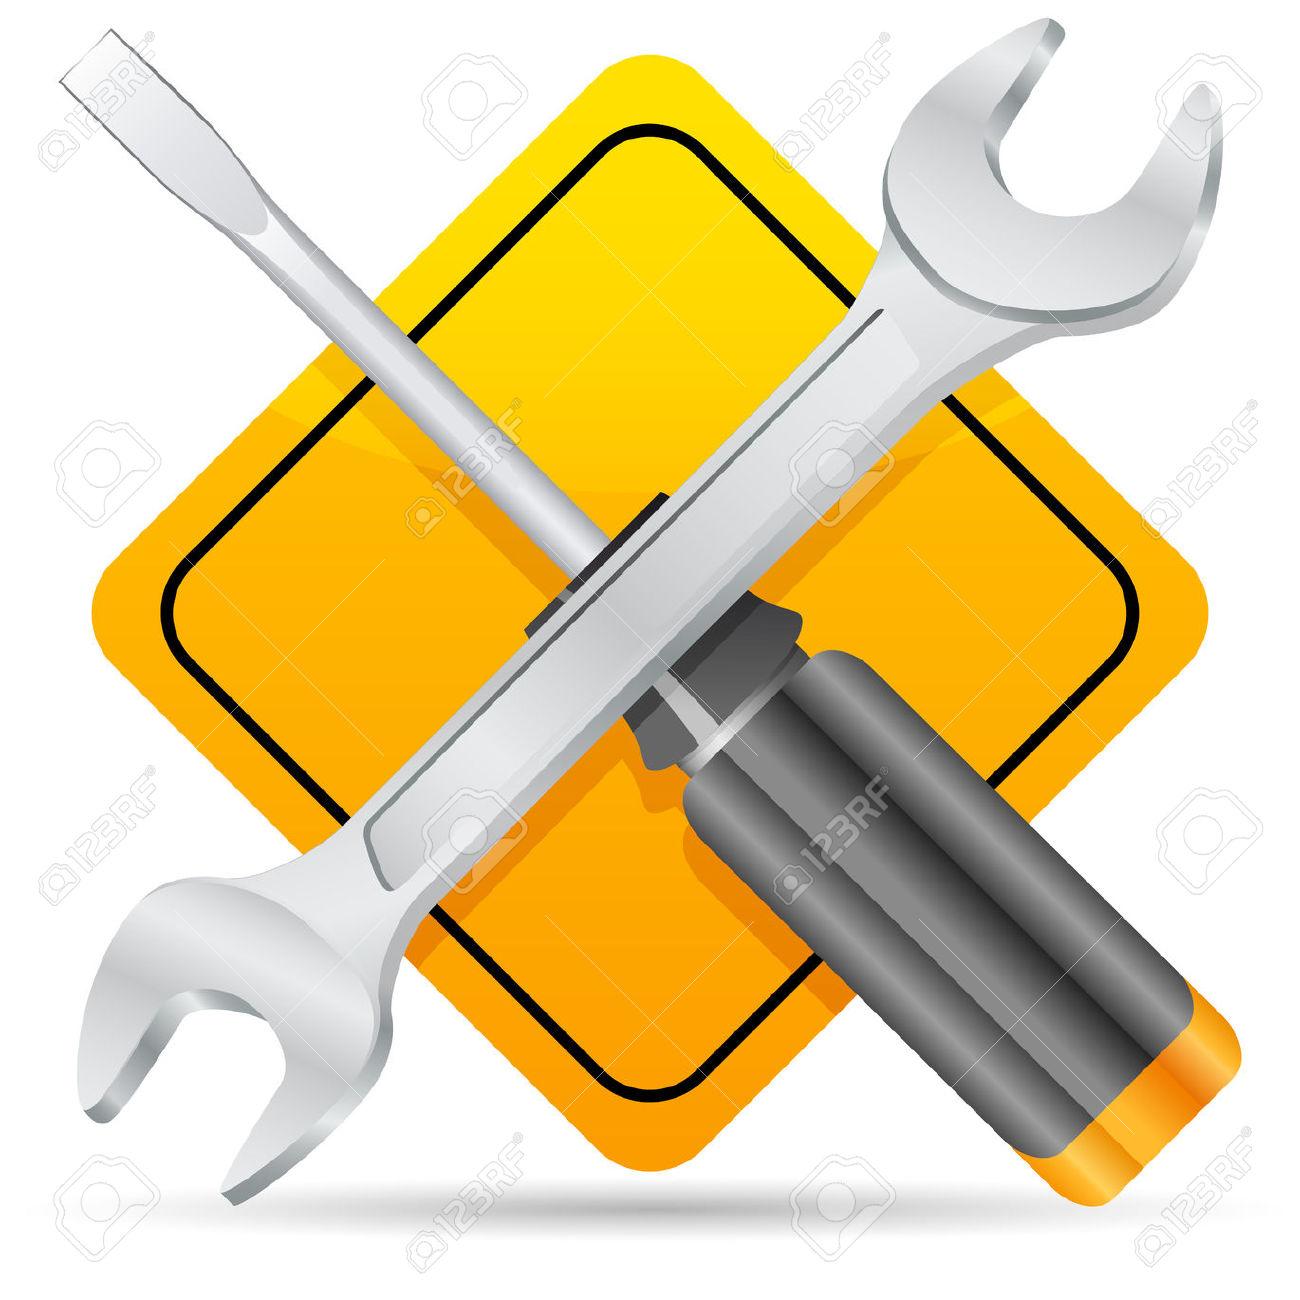 Maintenance Clipart.